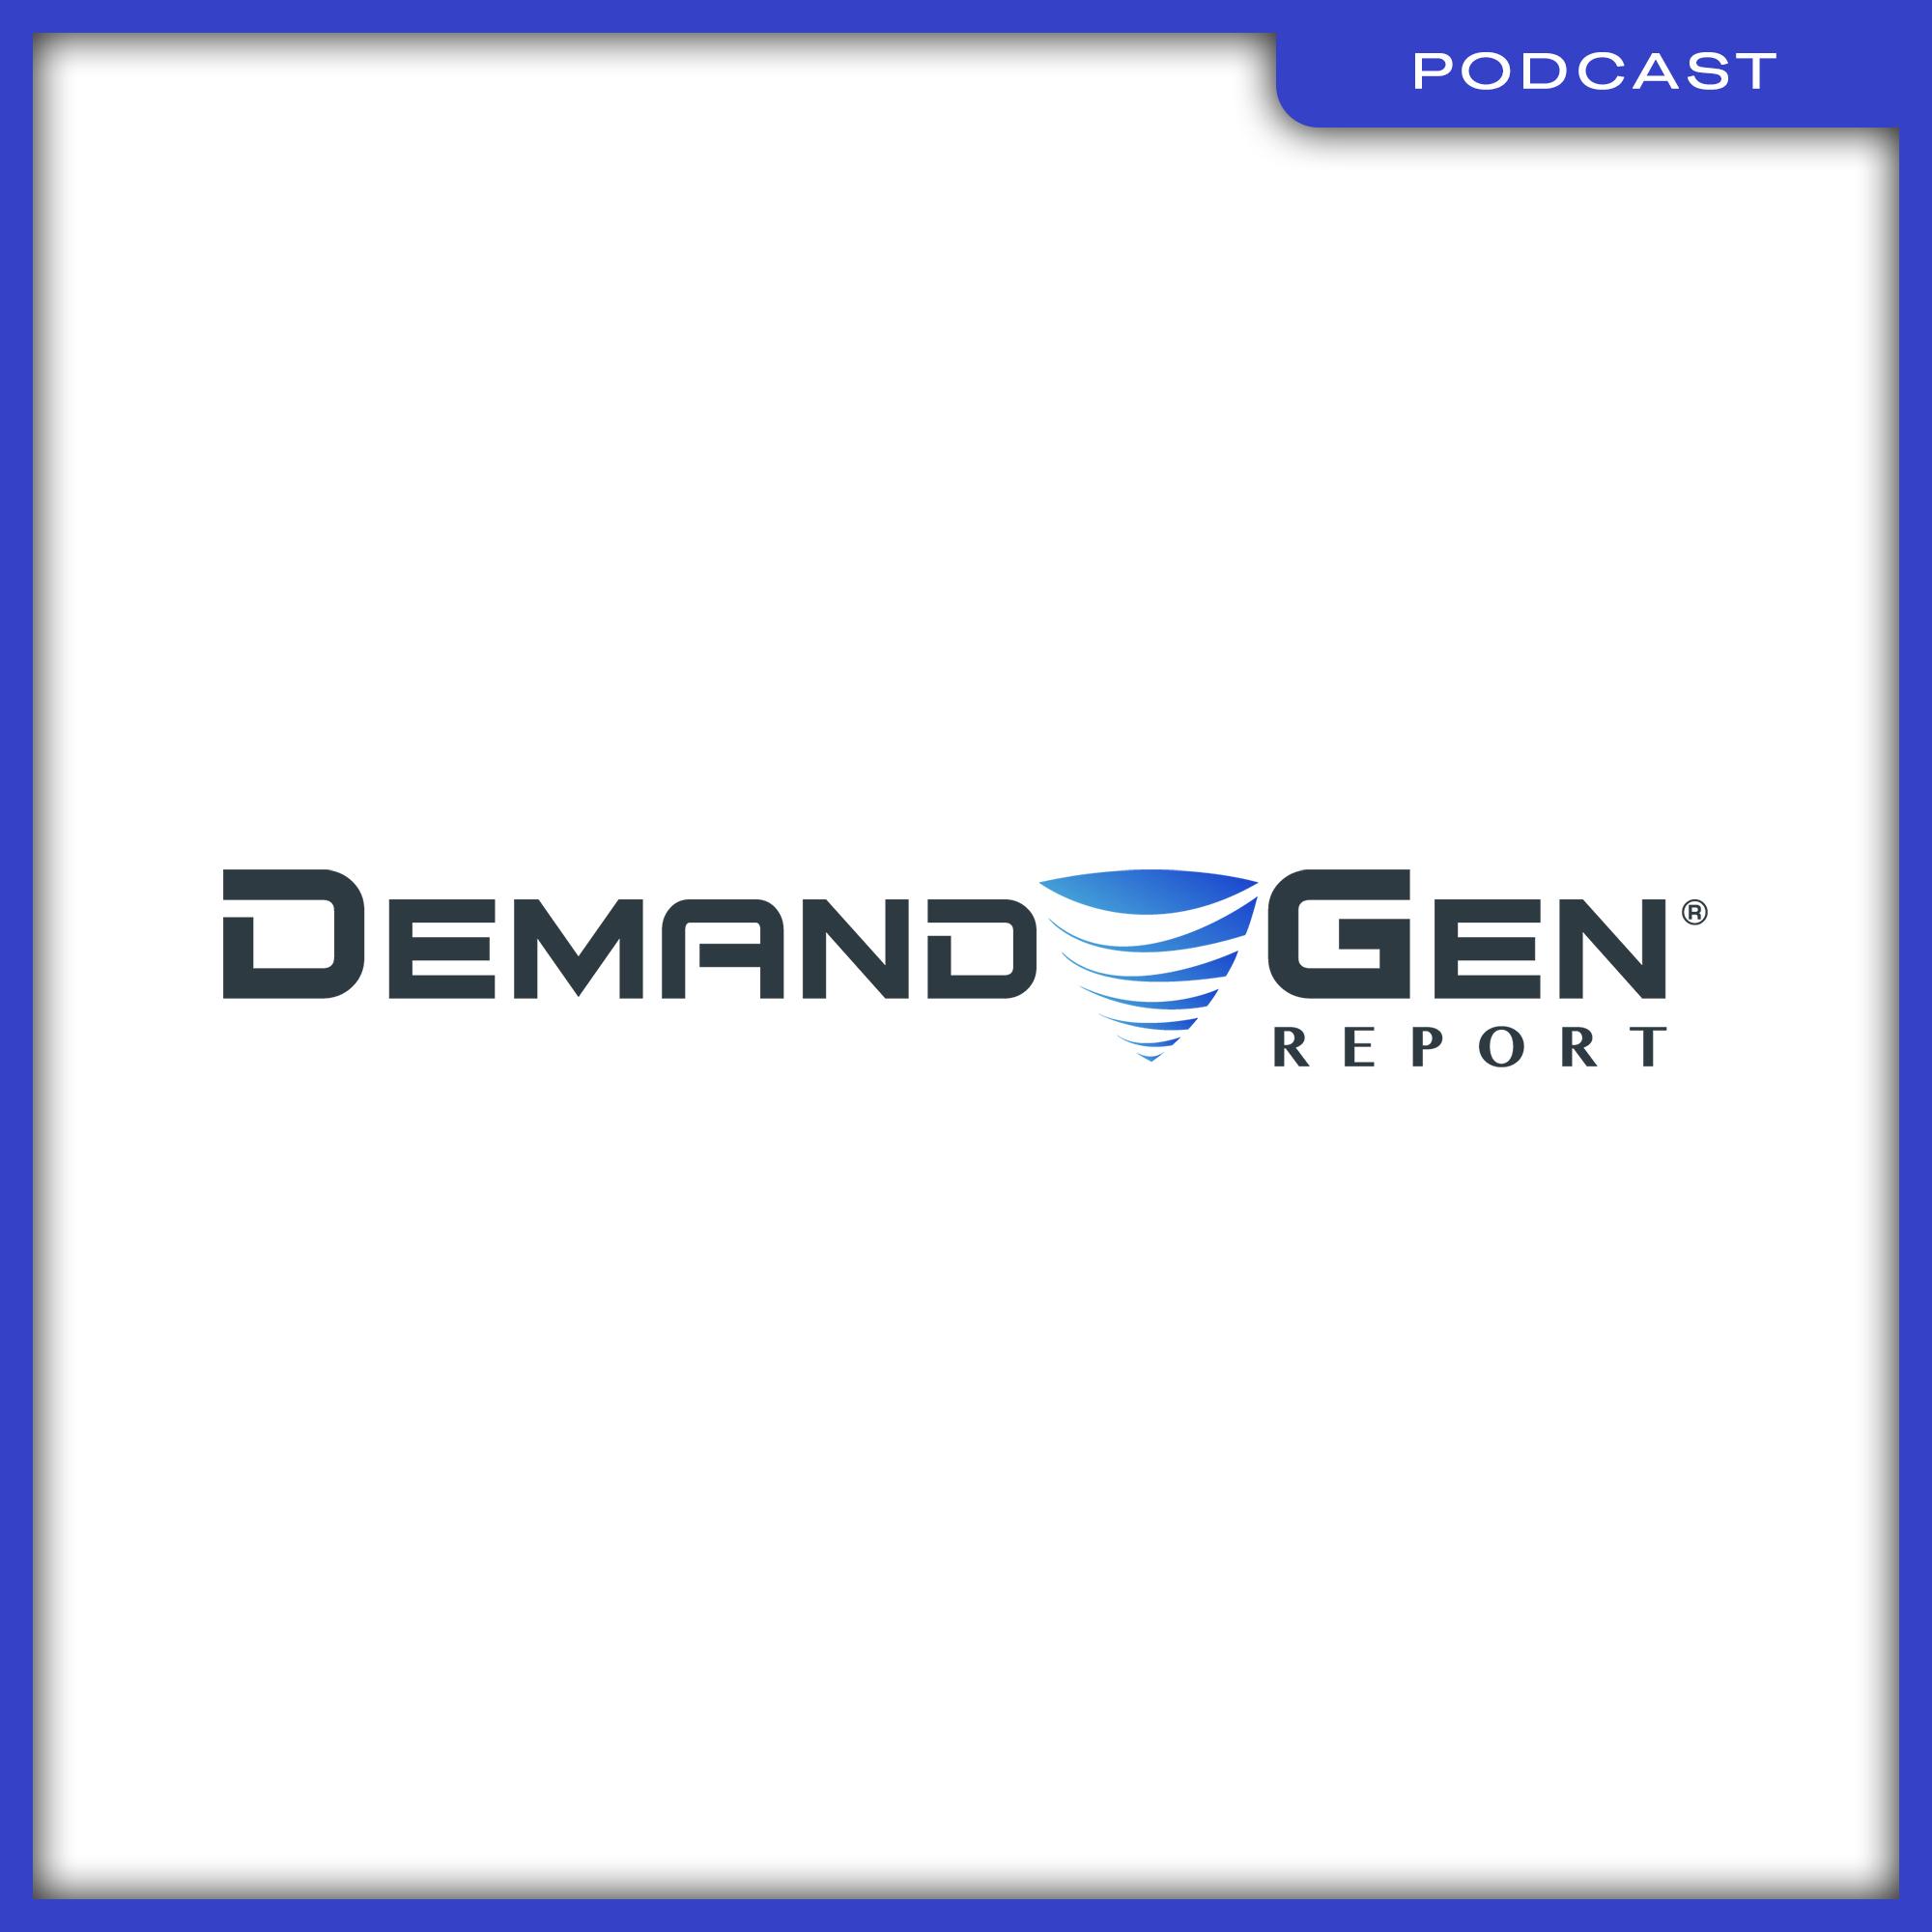 07_Podcast_DemandGenReport